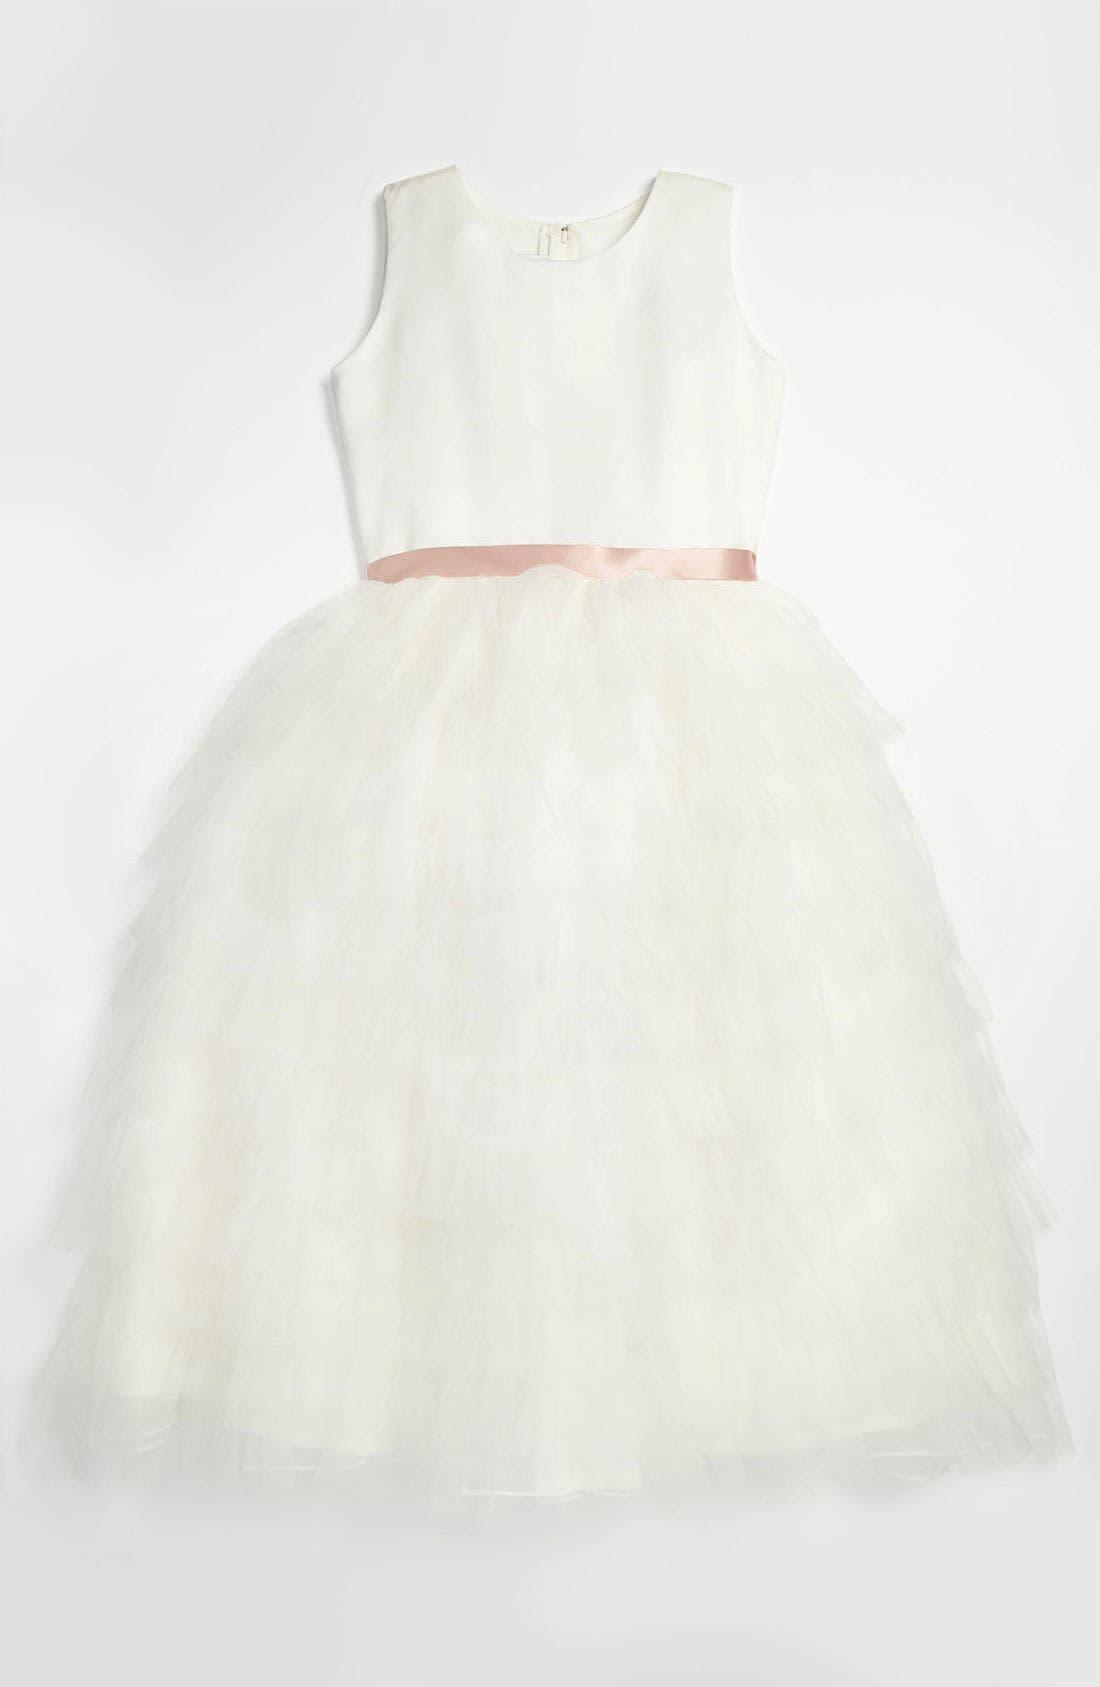 Main Image - Joan Calabrese for Mon Cheri 'Cupcake' Dress (Little Girls & Big Girls)